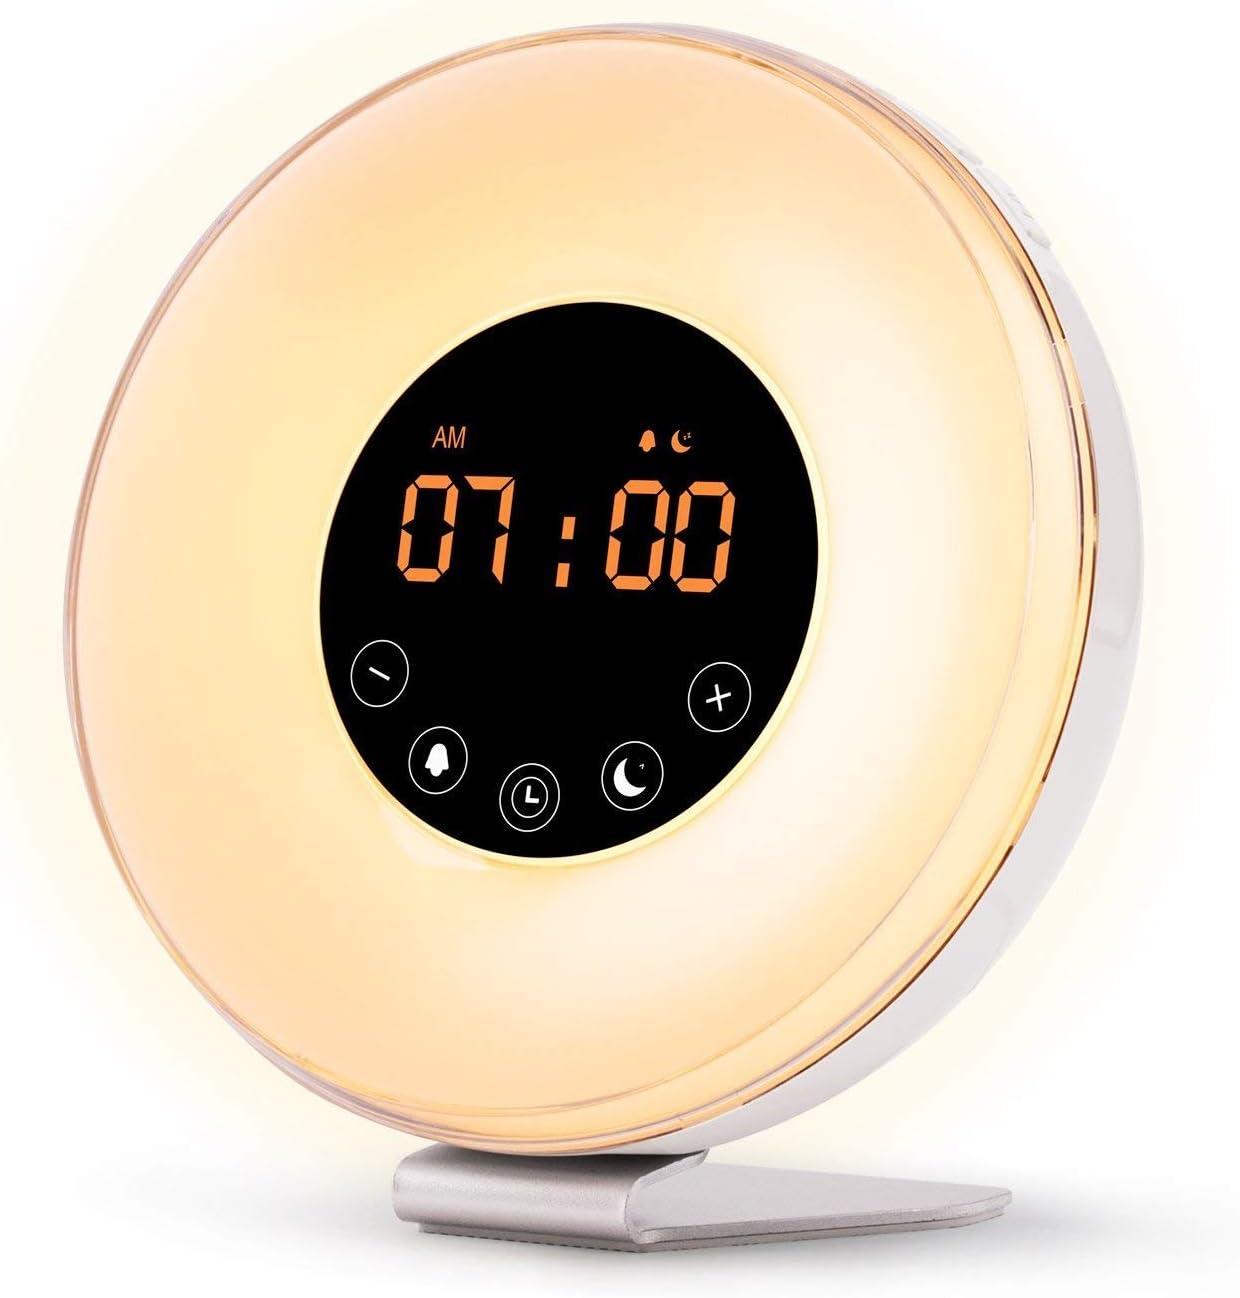 B00077AA60 River City Clocks Wake Up Light Digital Alarm Clock with Sunrise Simulation - 6 Nature Sounds, FM Radio, Sunset Fading Night Light for Bedside and Kids, Sunrise Digital Alarm Clock for Heavy Sleepers 61oo24HVsJL.SL1500_